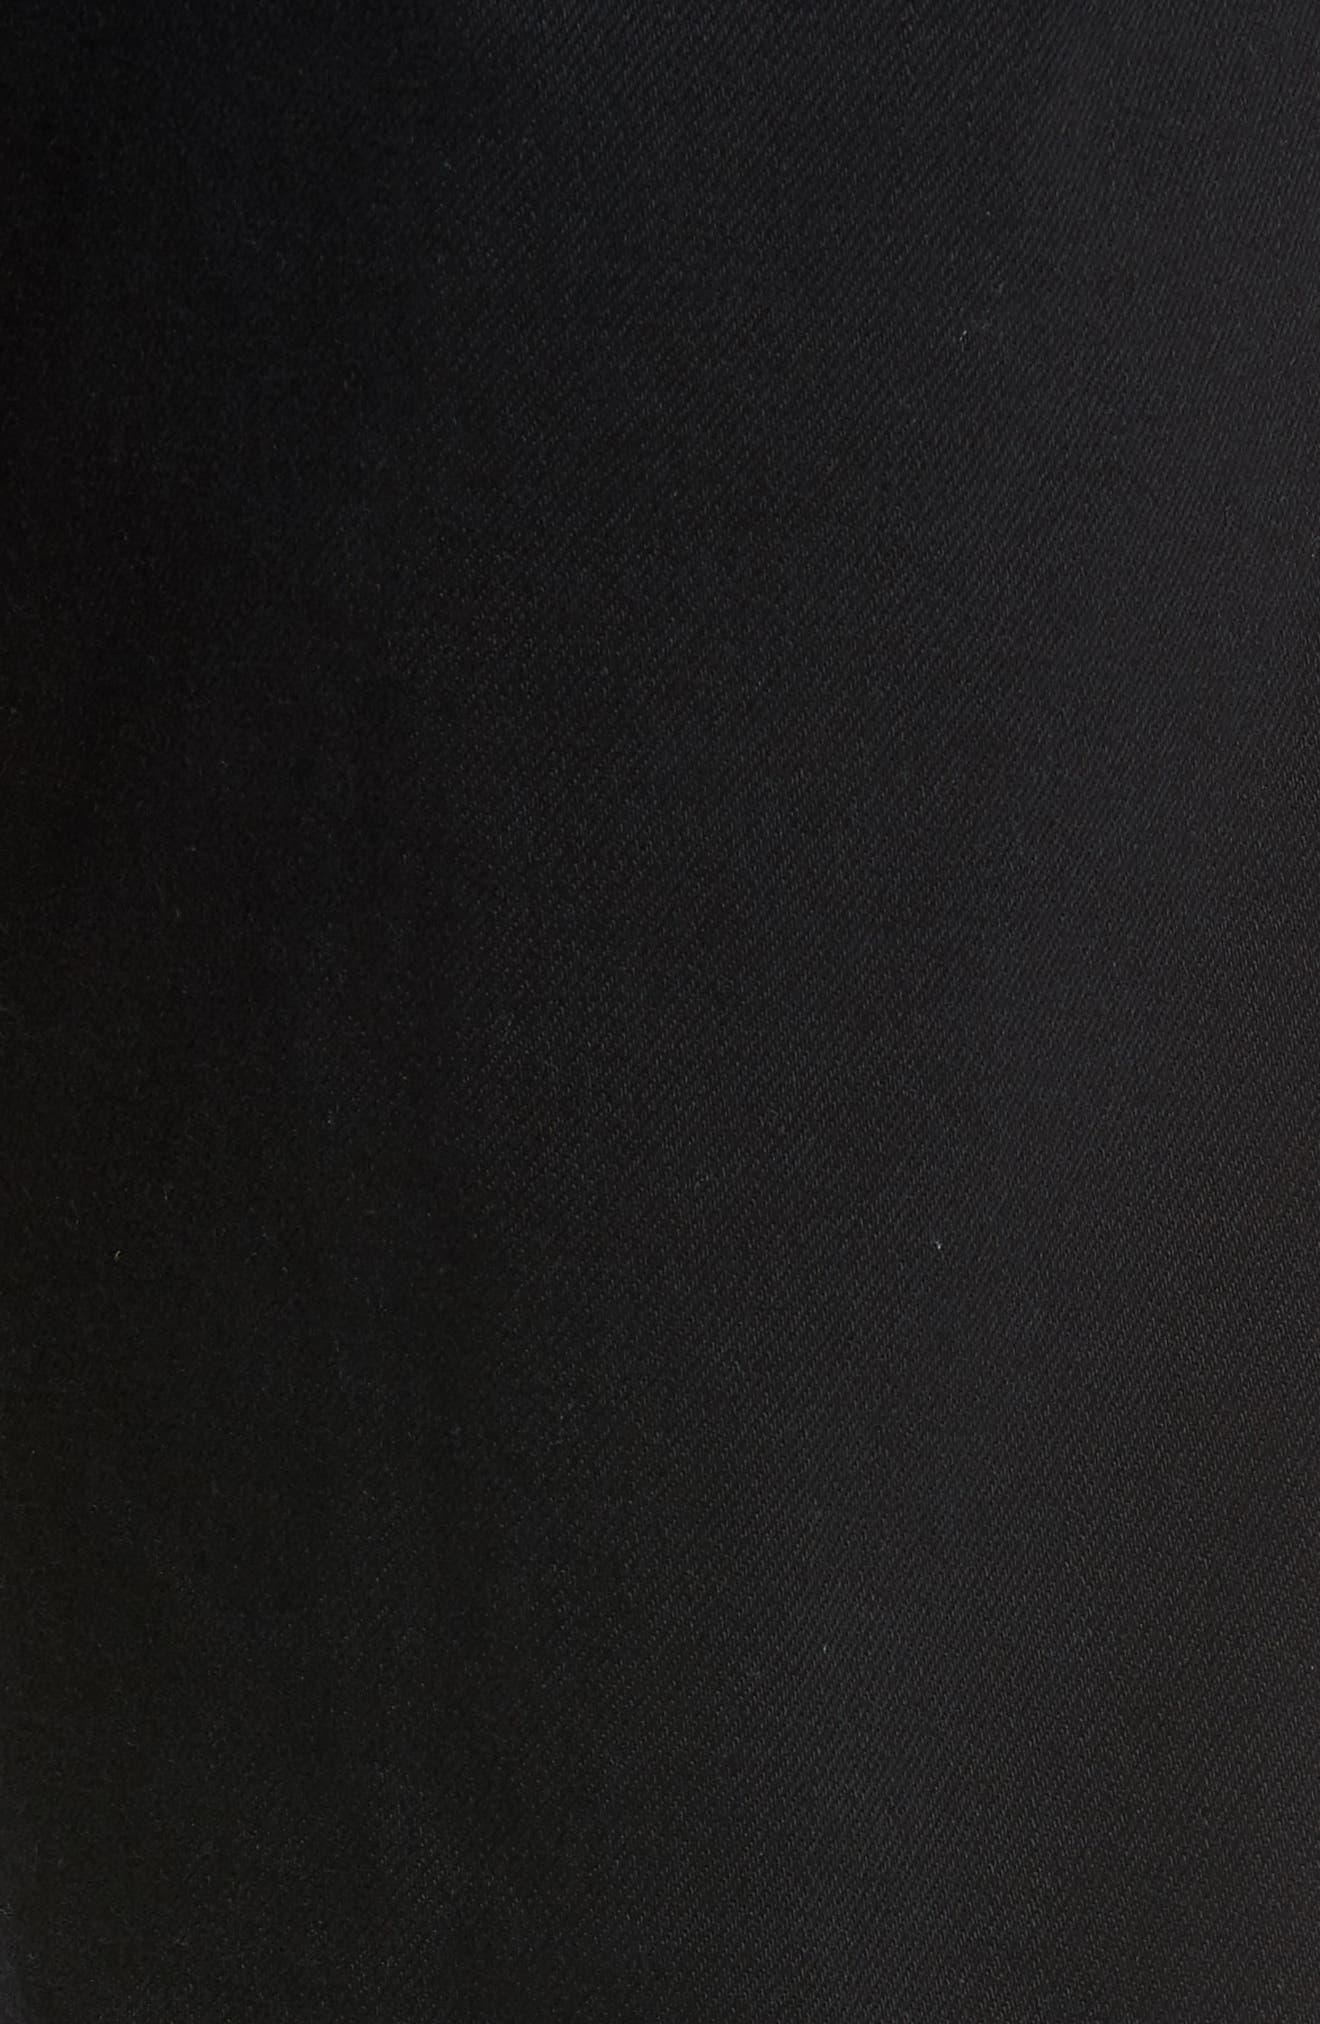 Zach Straight Leg Jeans,                             Alternate thumbnail 5, color,                             BLACK WILLIAMSBURG